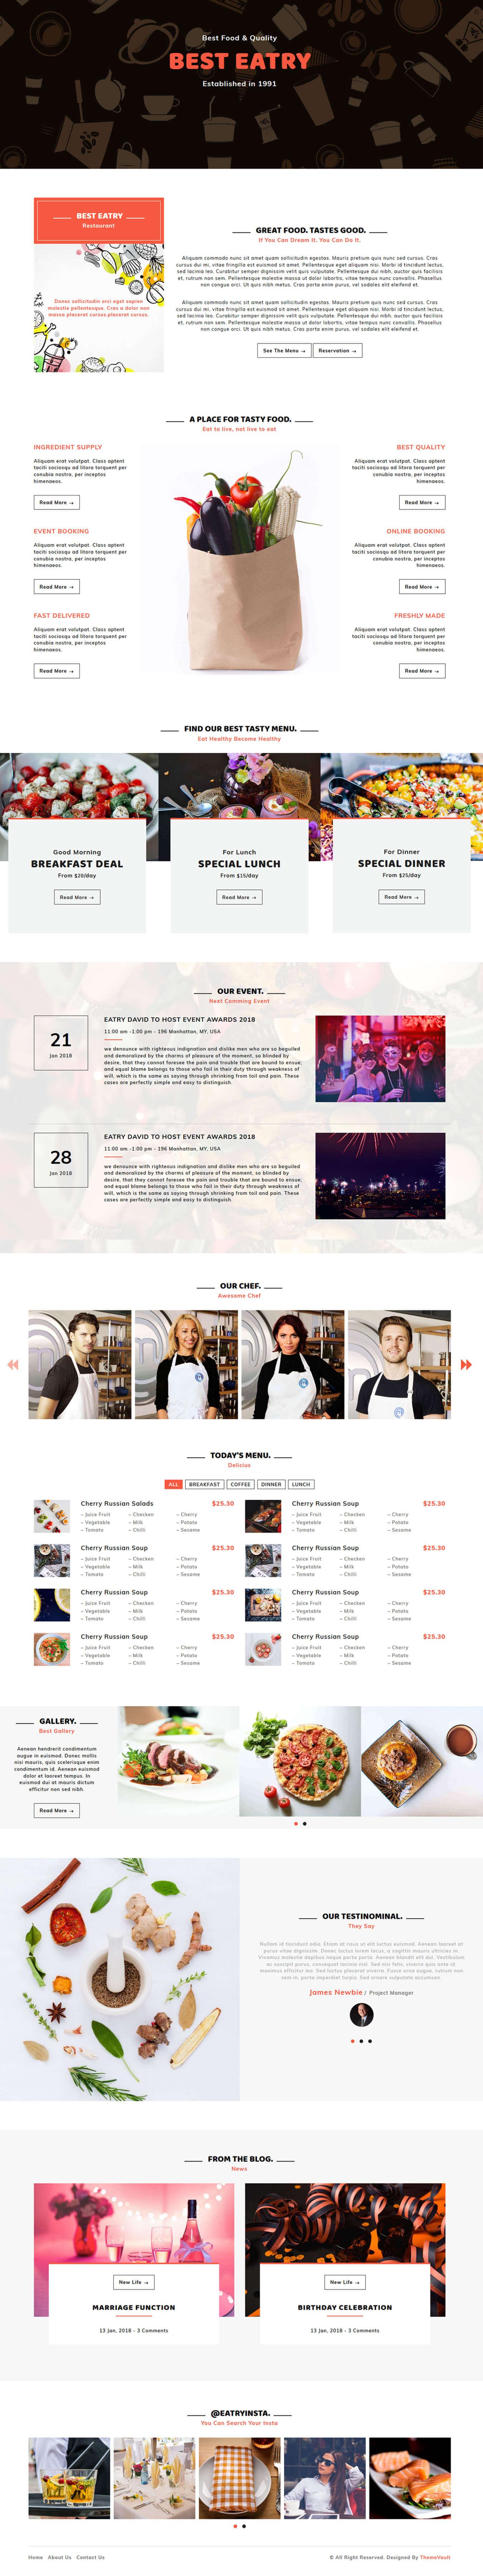 Eatry - Responsive Restaurant Template HTML5